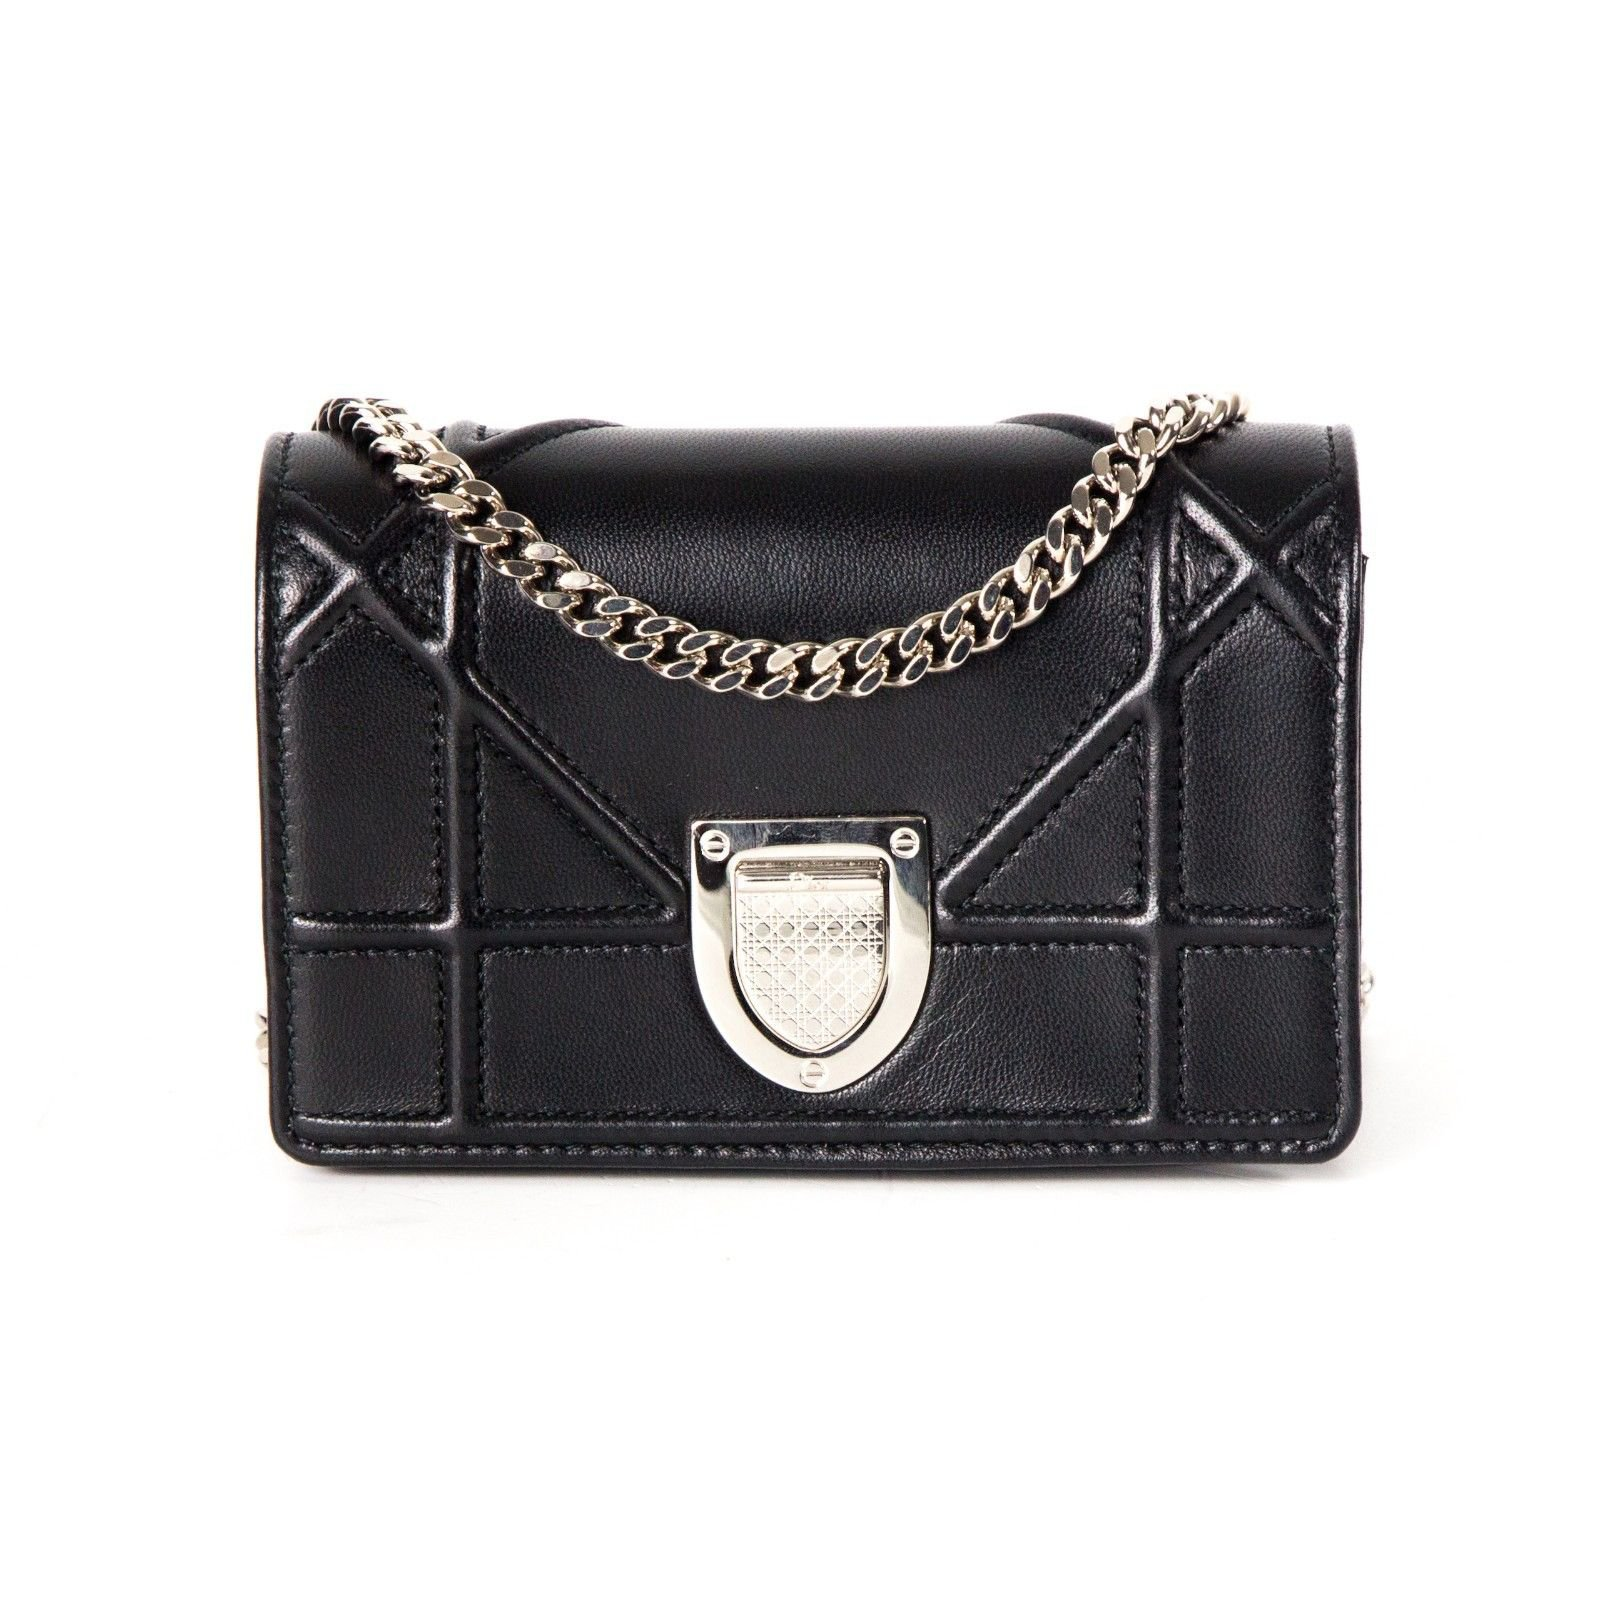 5492b4762c66 Christian Dior Diorama Mini Crossbody Bag Handbags Leather Black ref.37153